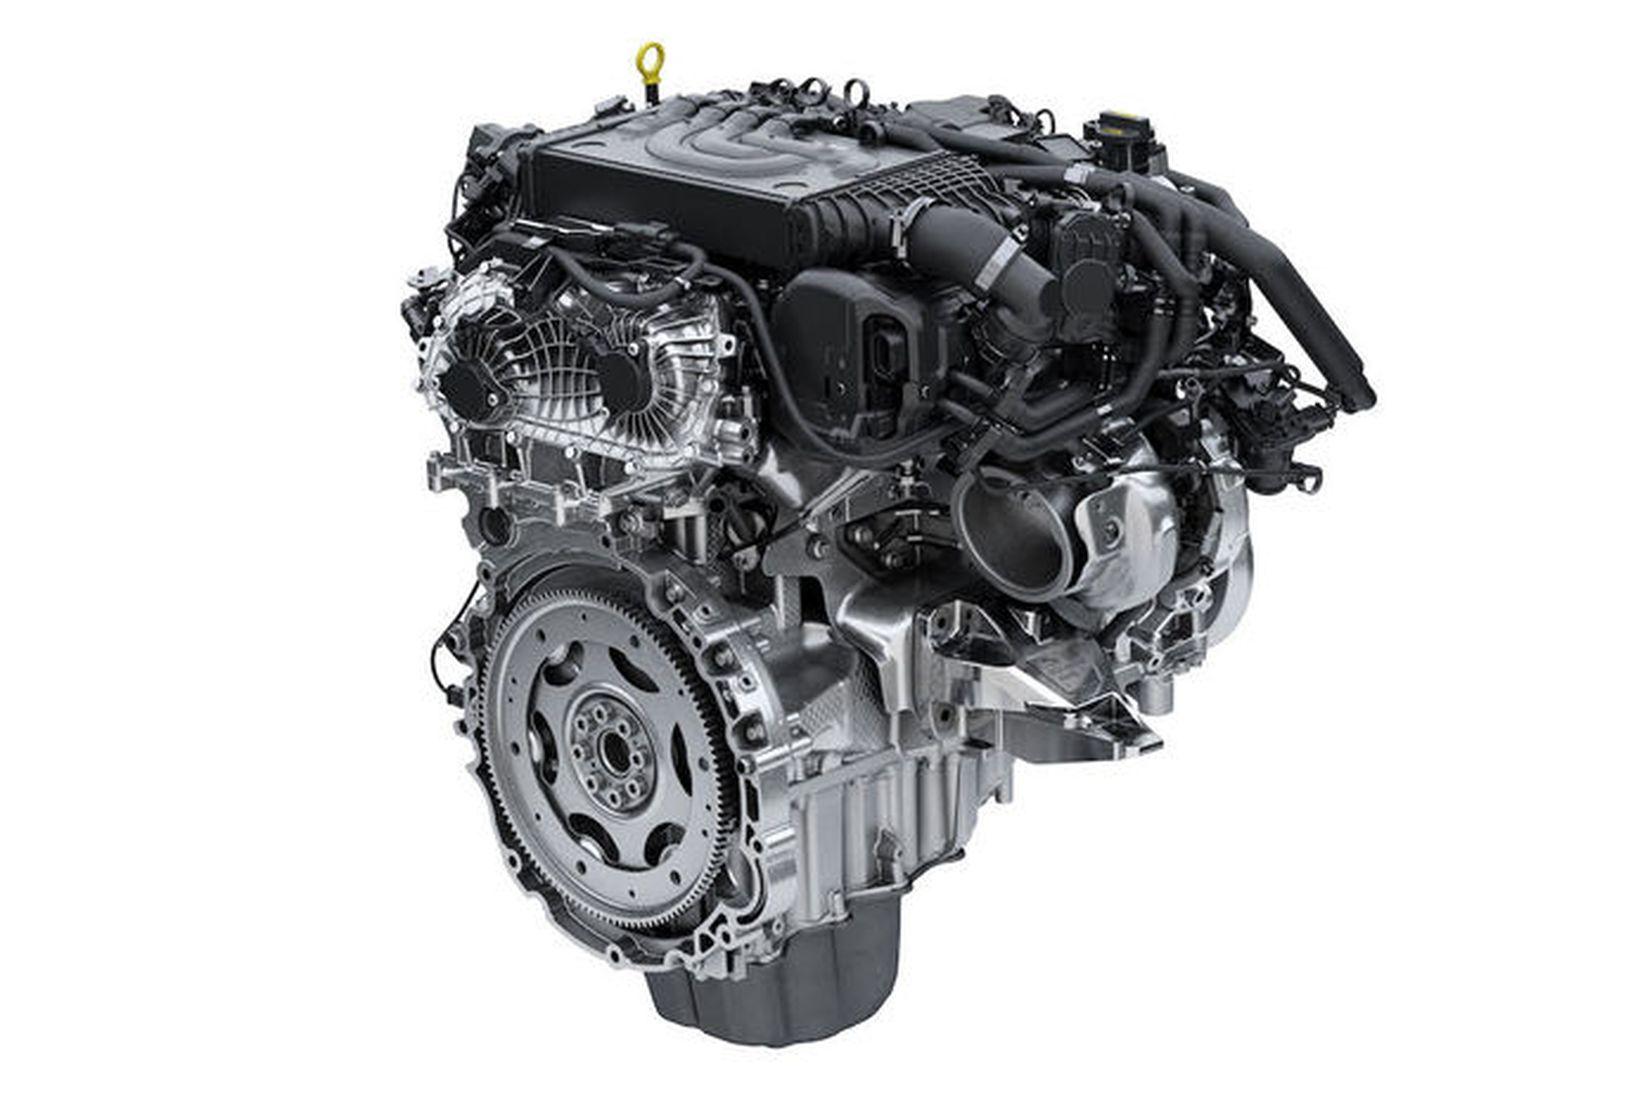 Ný Ingeniumvél Jaguar Land Rover.